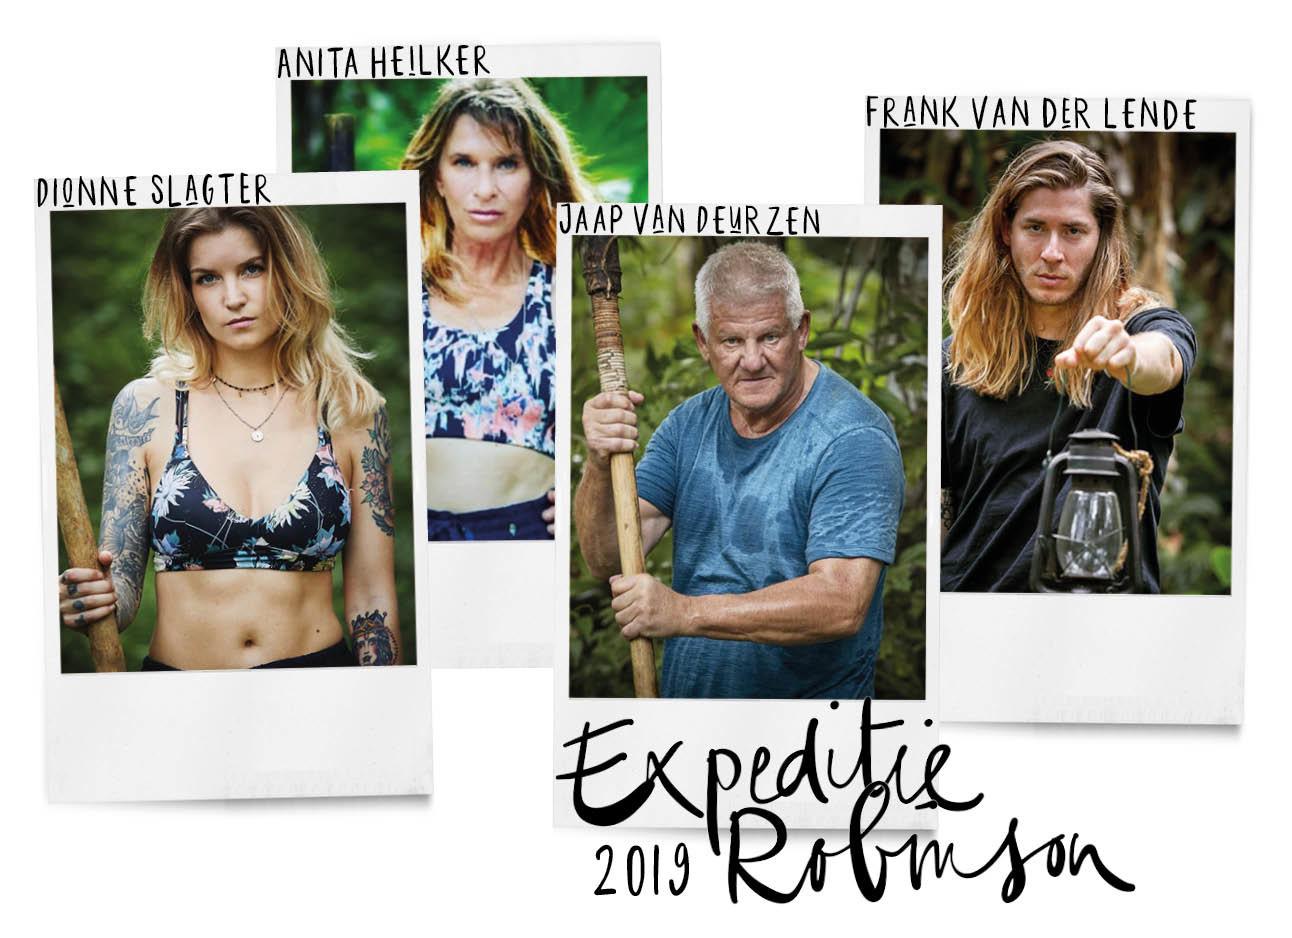 expeditie robinson kandidaten 2019